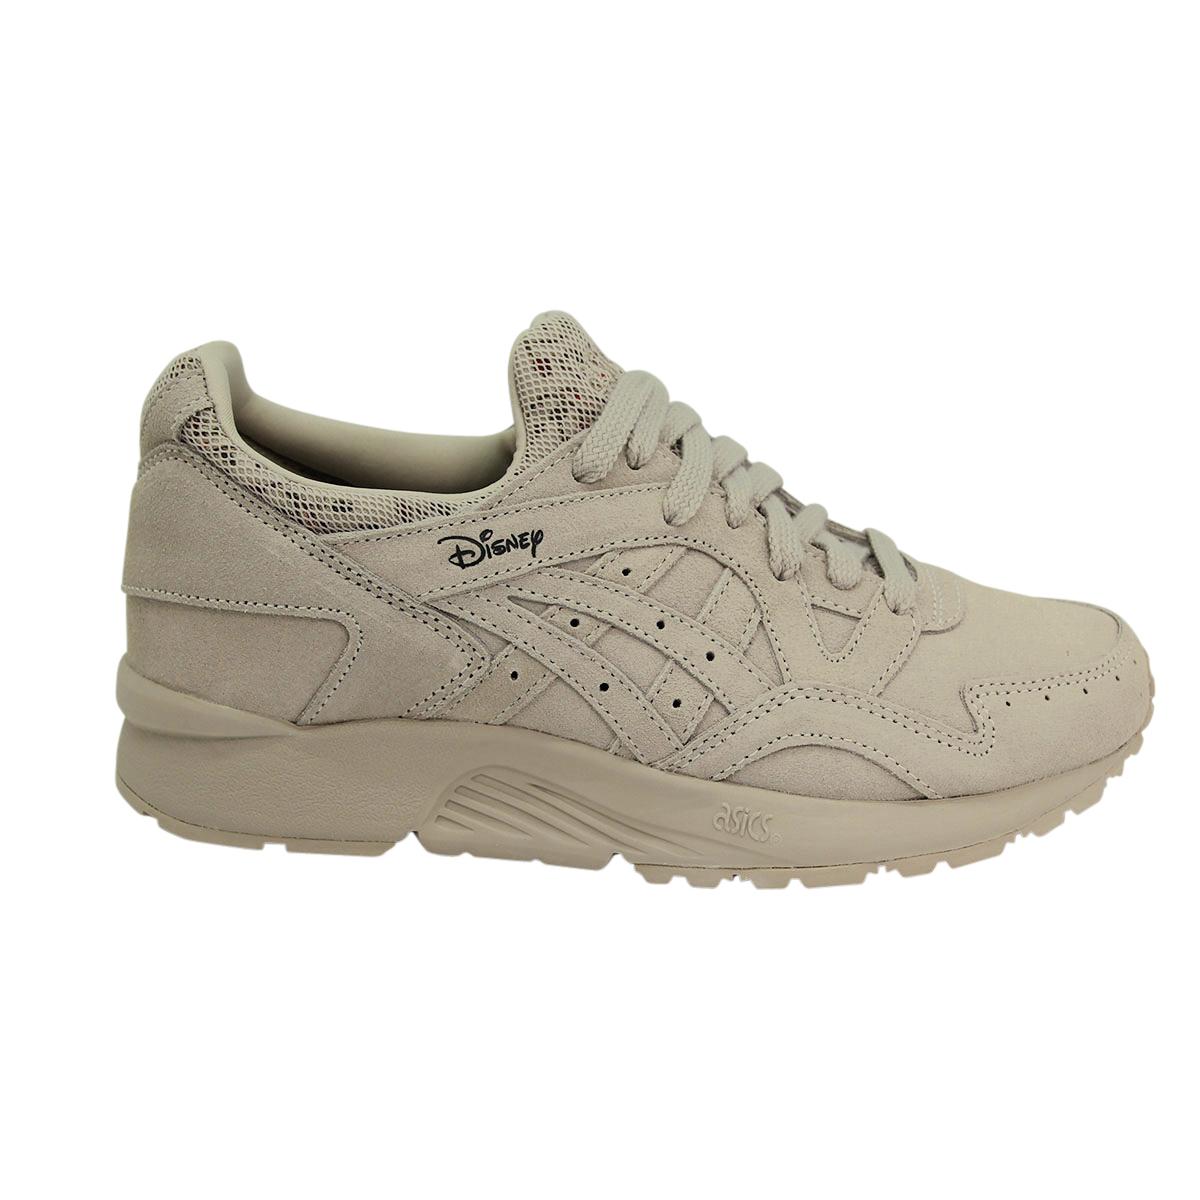 ASICS Gel-Lyte V da donna scarpe da ginnastica Scarpe Nuovo